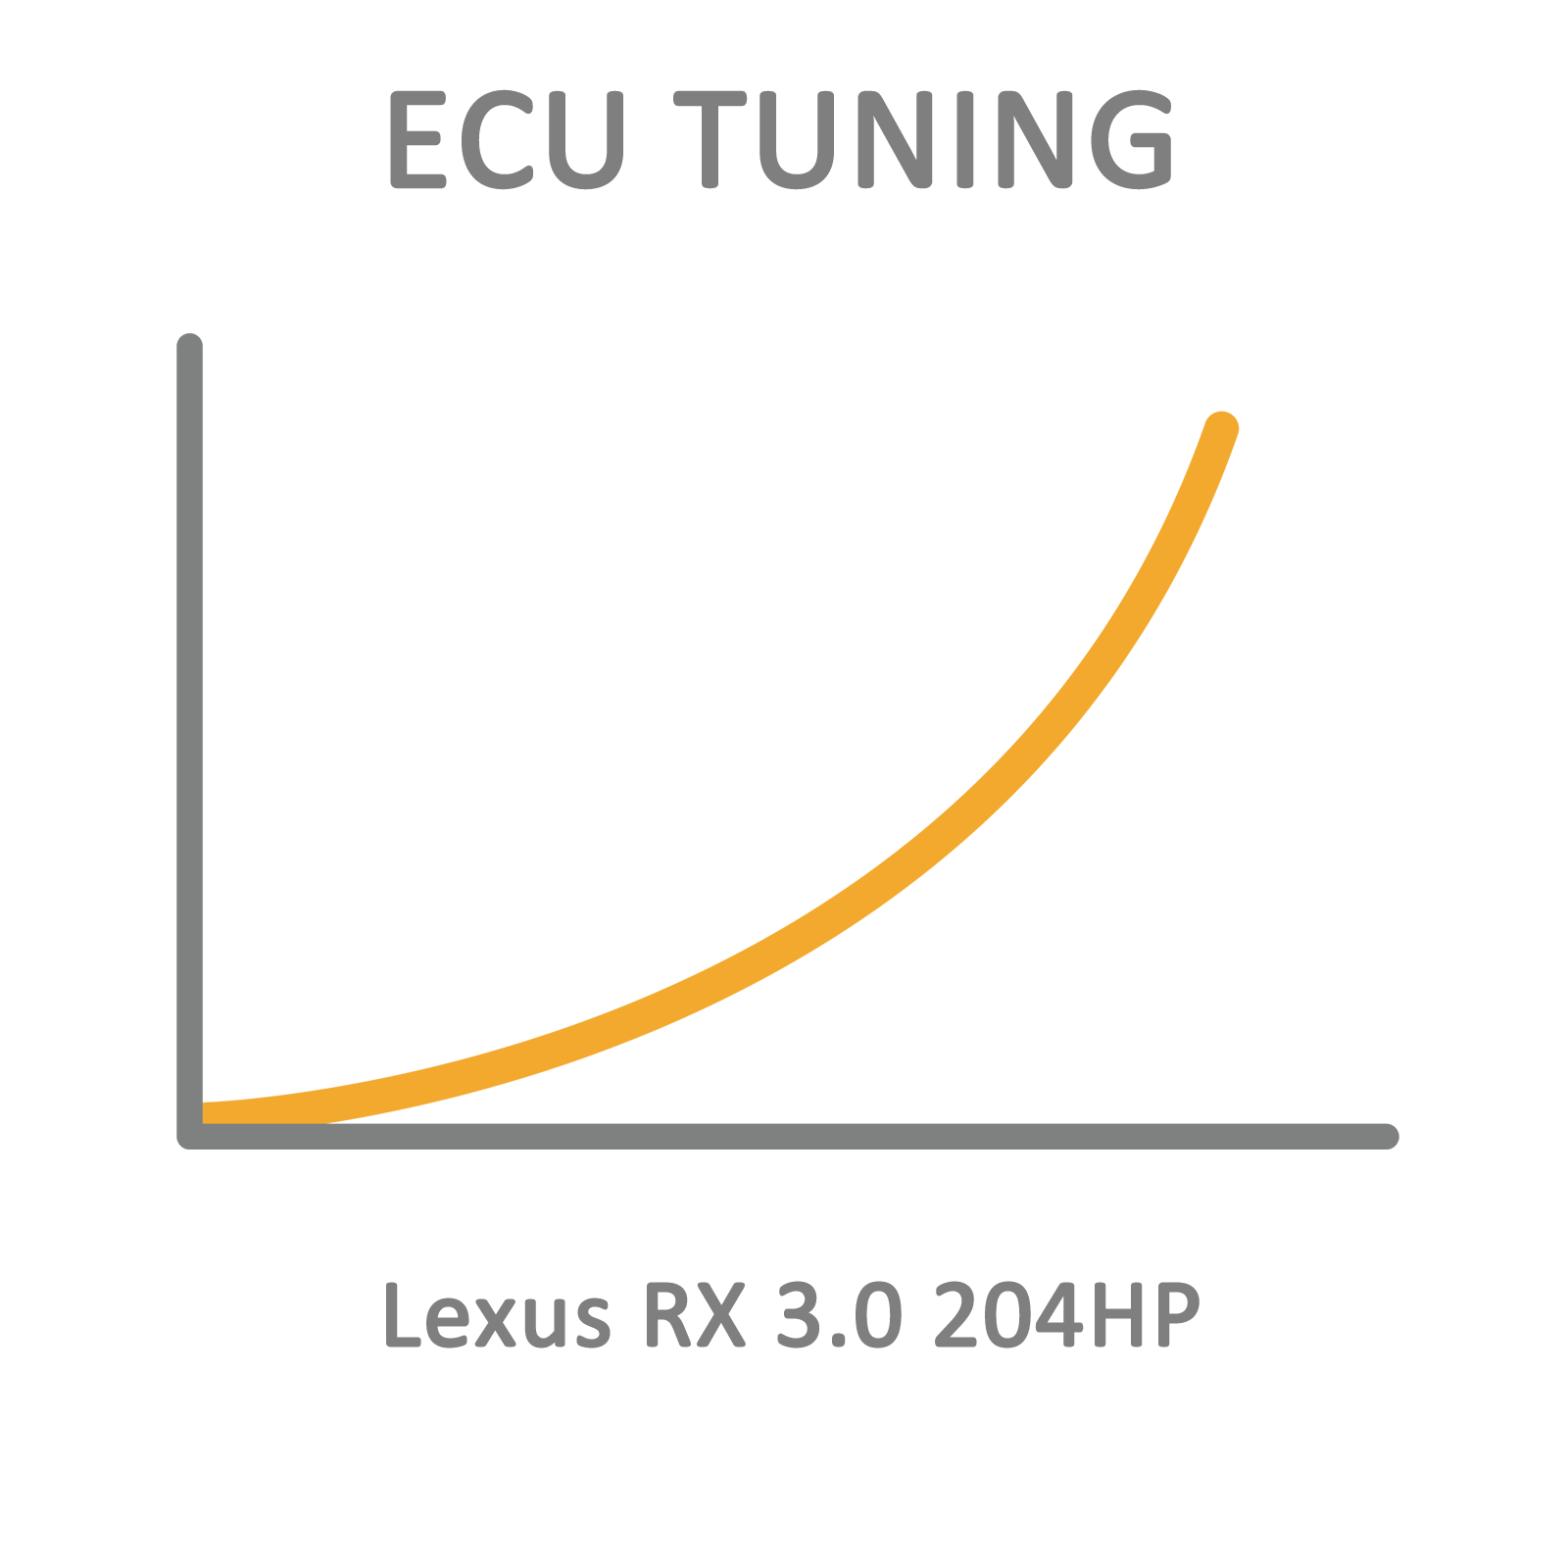 Lexus RX 3.0 204HP ECU Tuning Remapping Programming